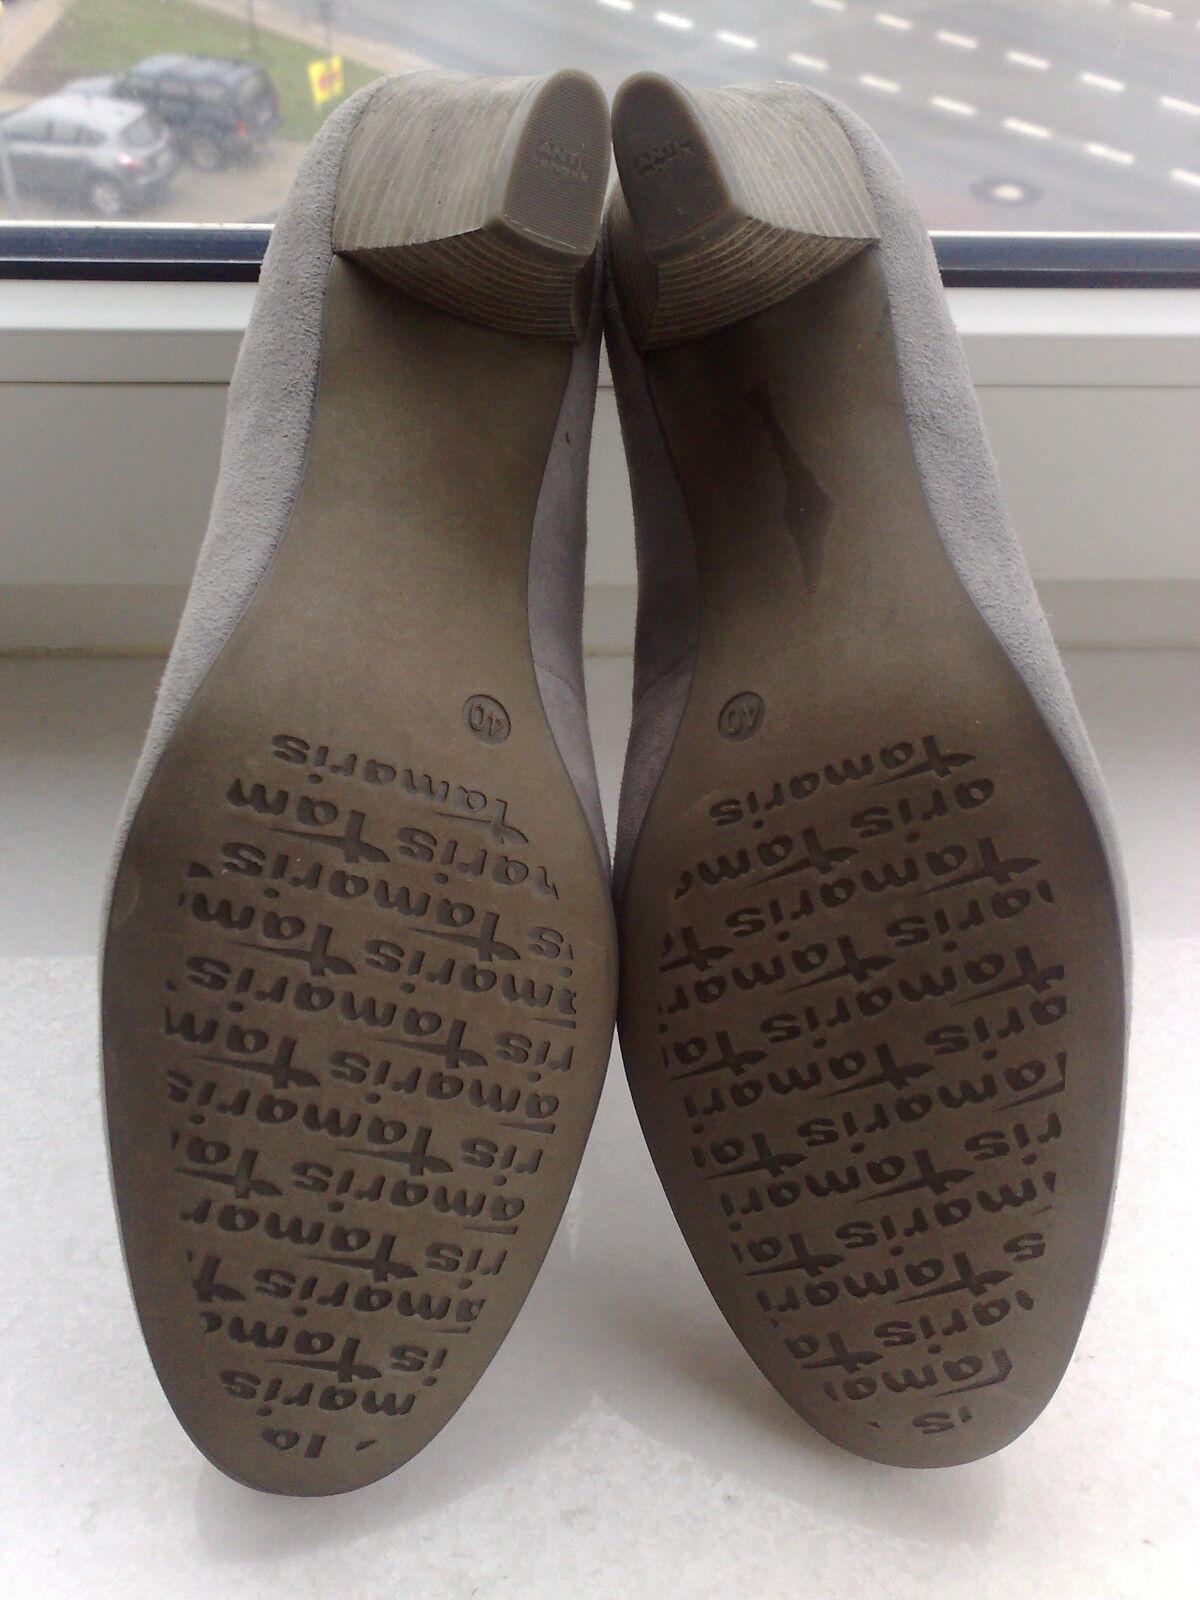 NEW TAMARIS  leather pumps shoes heel EUR US 9  9.5 EUR heel 40  beautiful   gray from UK c1e8dd